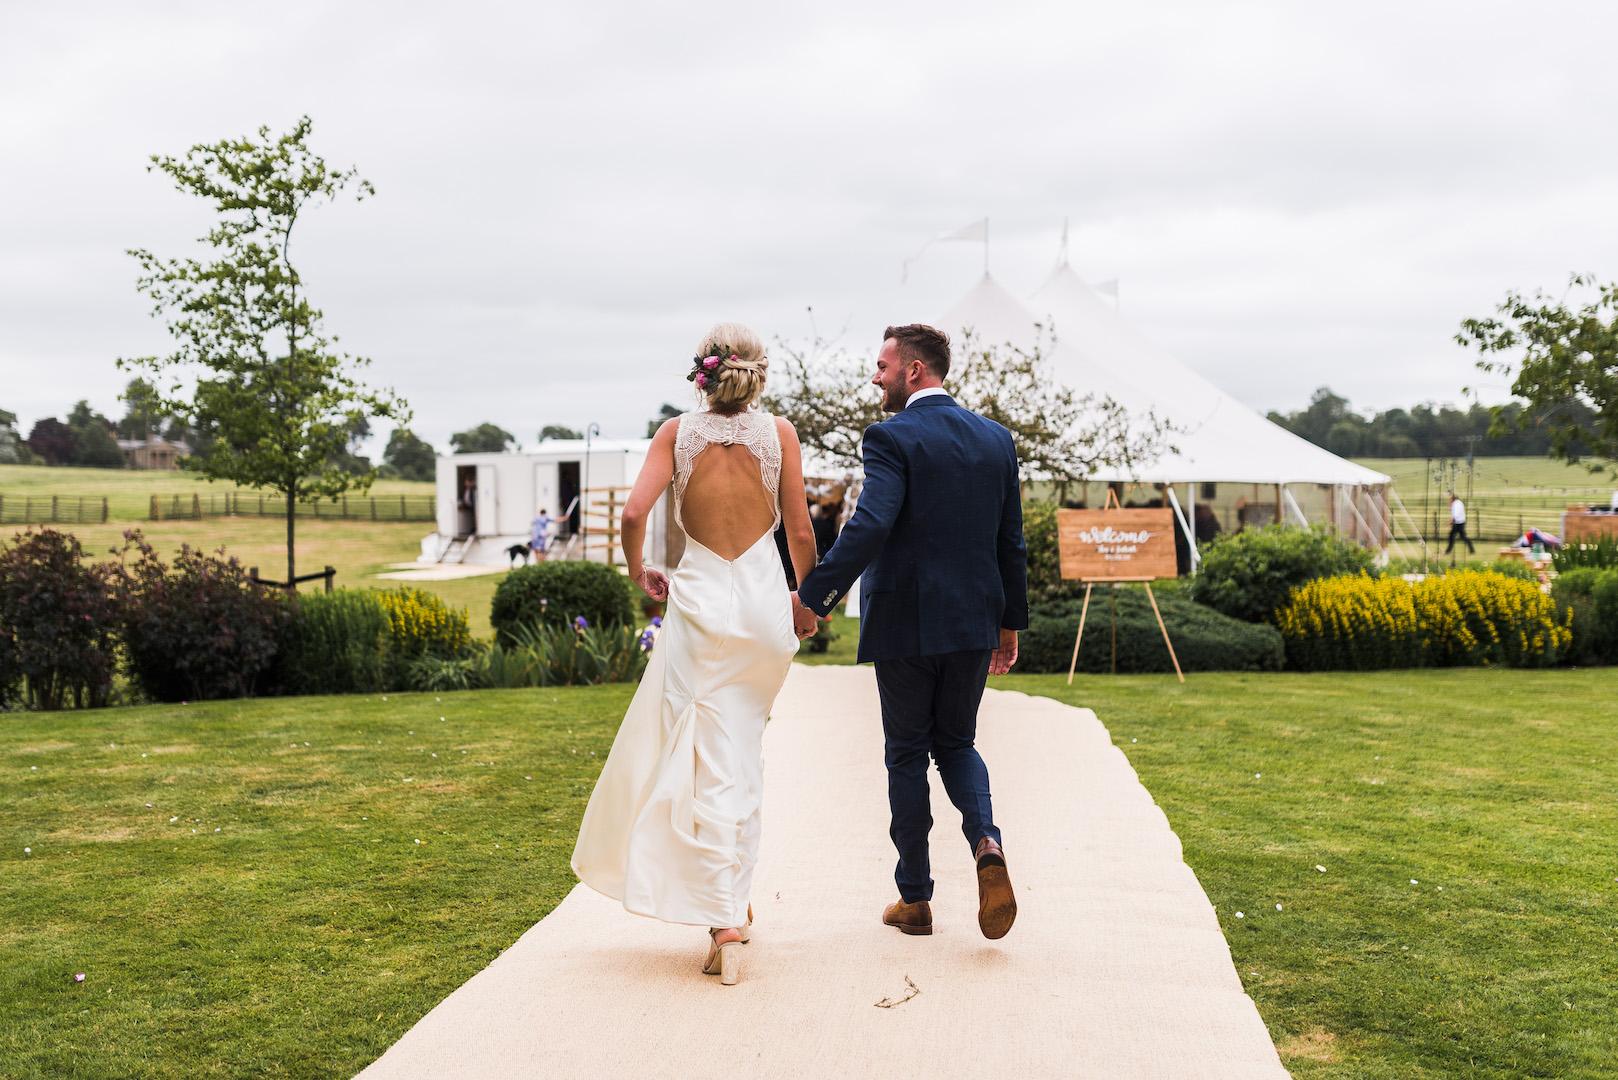 Sarah and Joe's PapaKata Sperry Wedding: Making an entrance